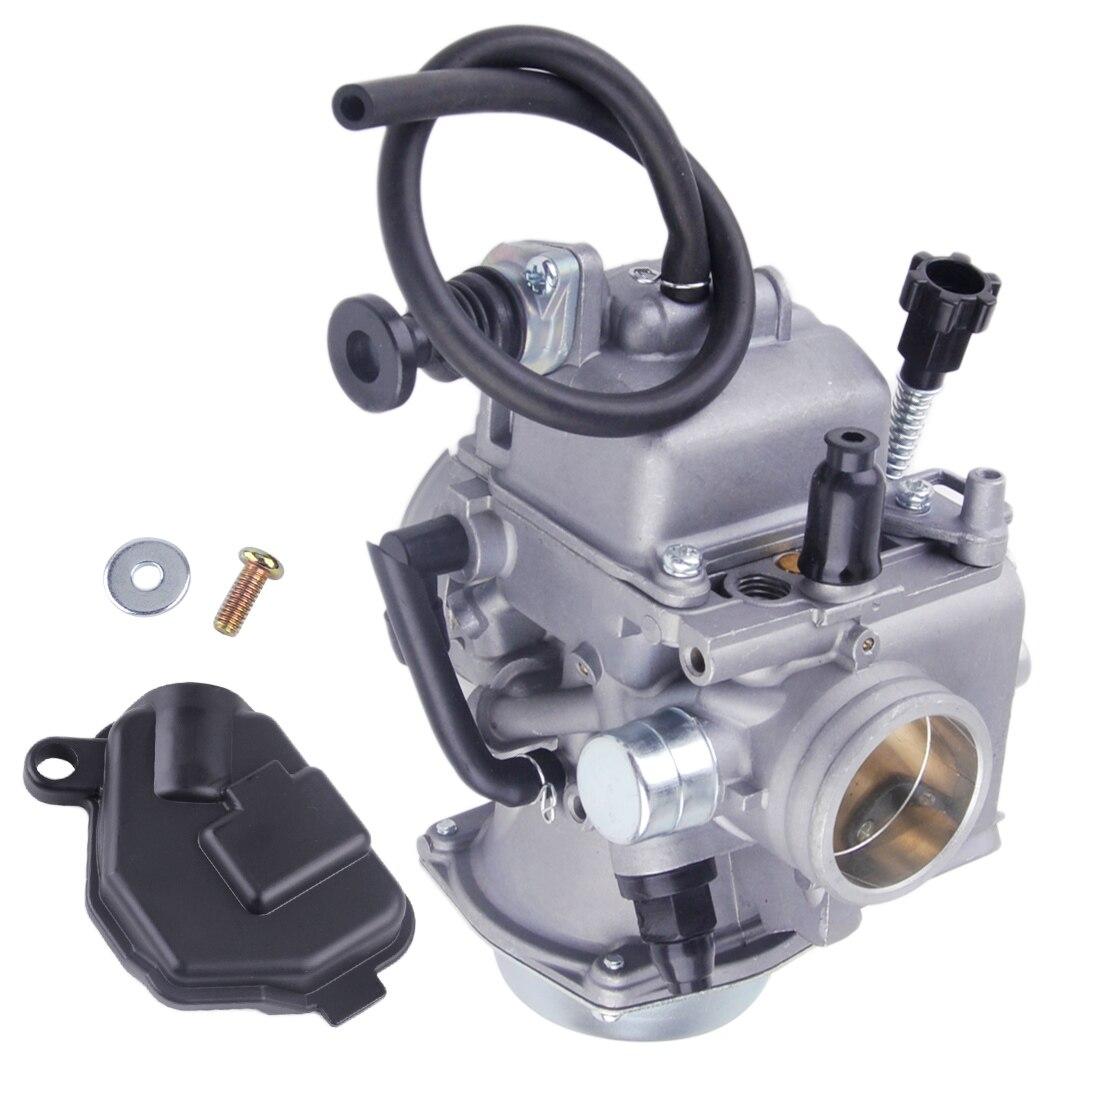 DWCX Motorcycle High Quality Metal Plastic Carburetor Cab Kit Set Fit for Honda TRX250 TRX 250 Fourtrax ATV Carb 1985 1986 1987